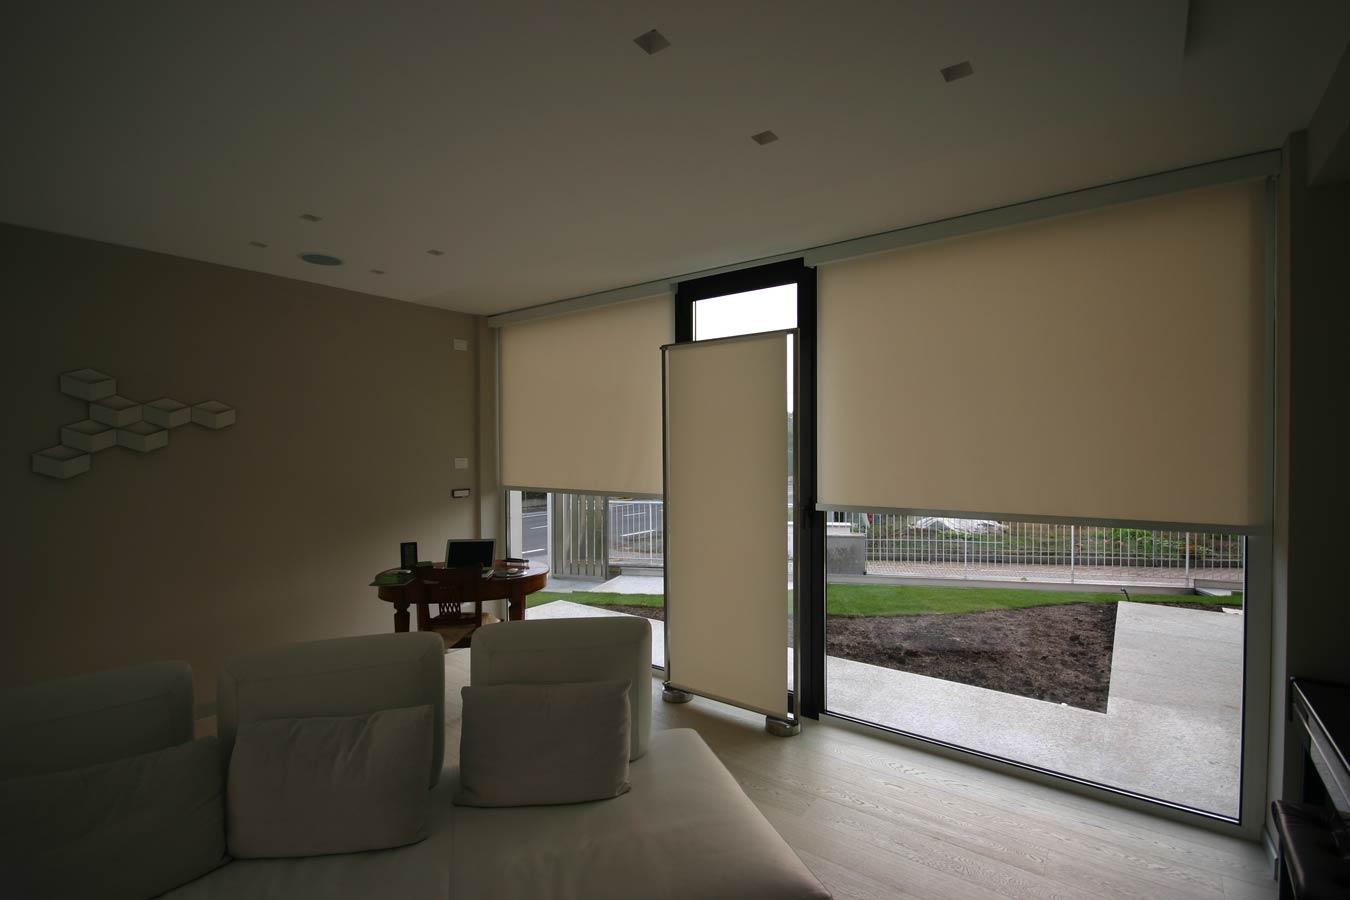 Tende oscuranti per finestre interne tende per finestre triangolari mansarda con tende - Finestre con tende interne ...